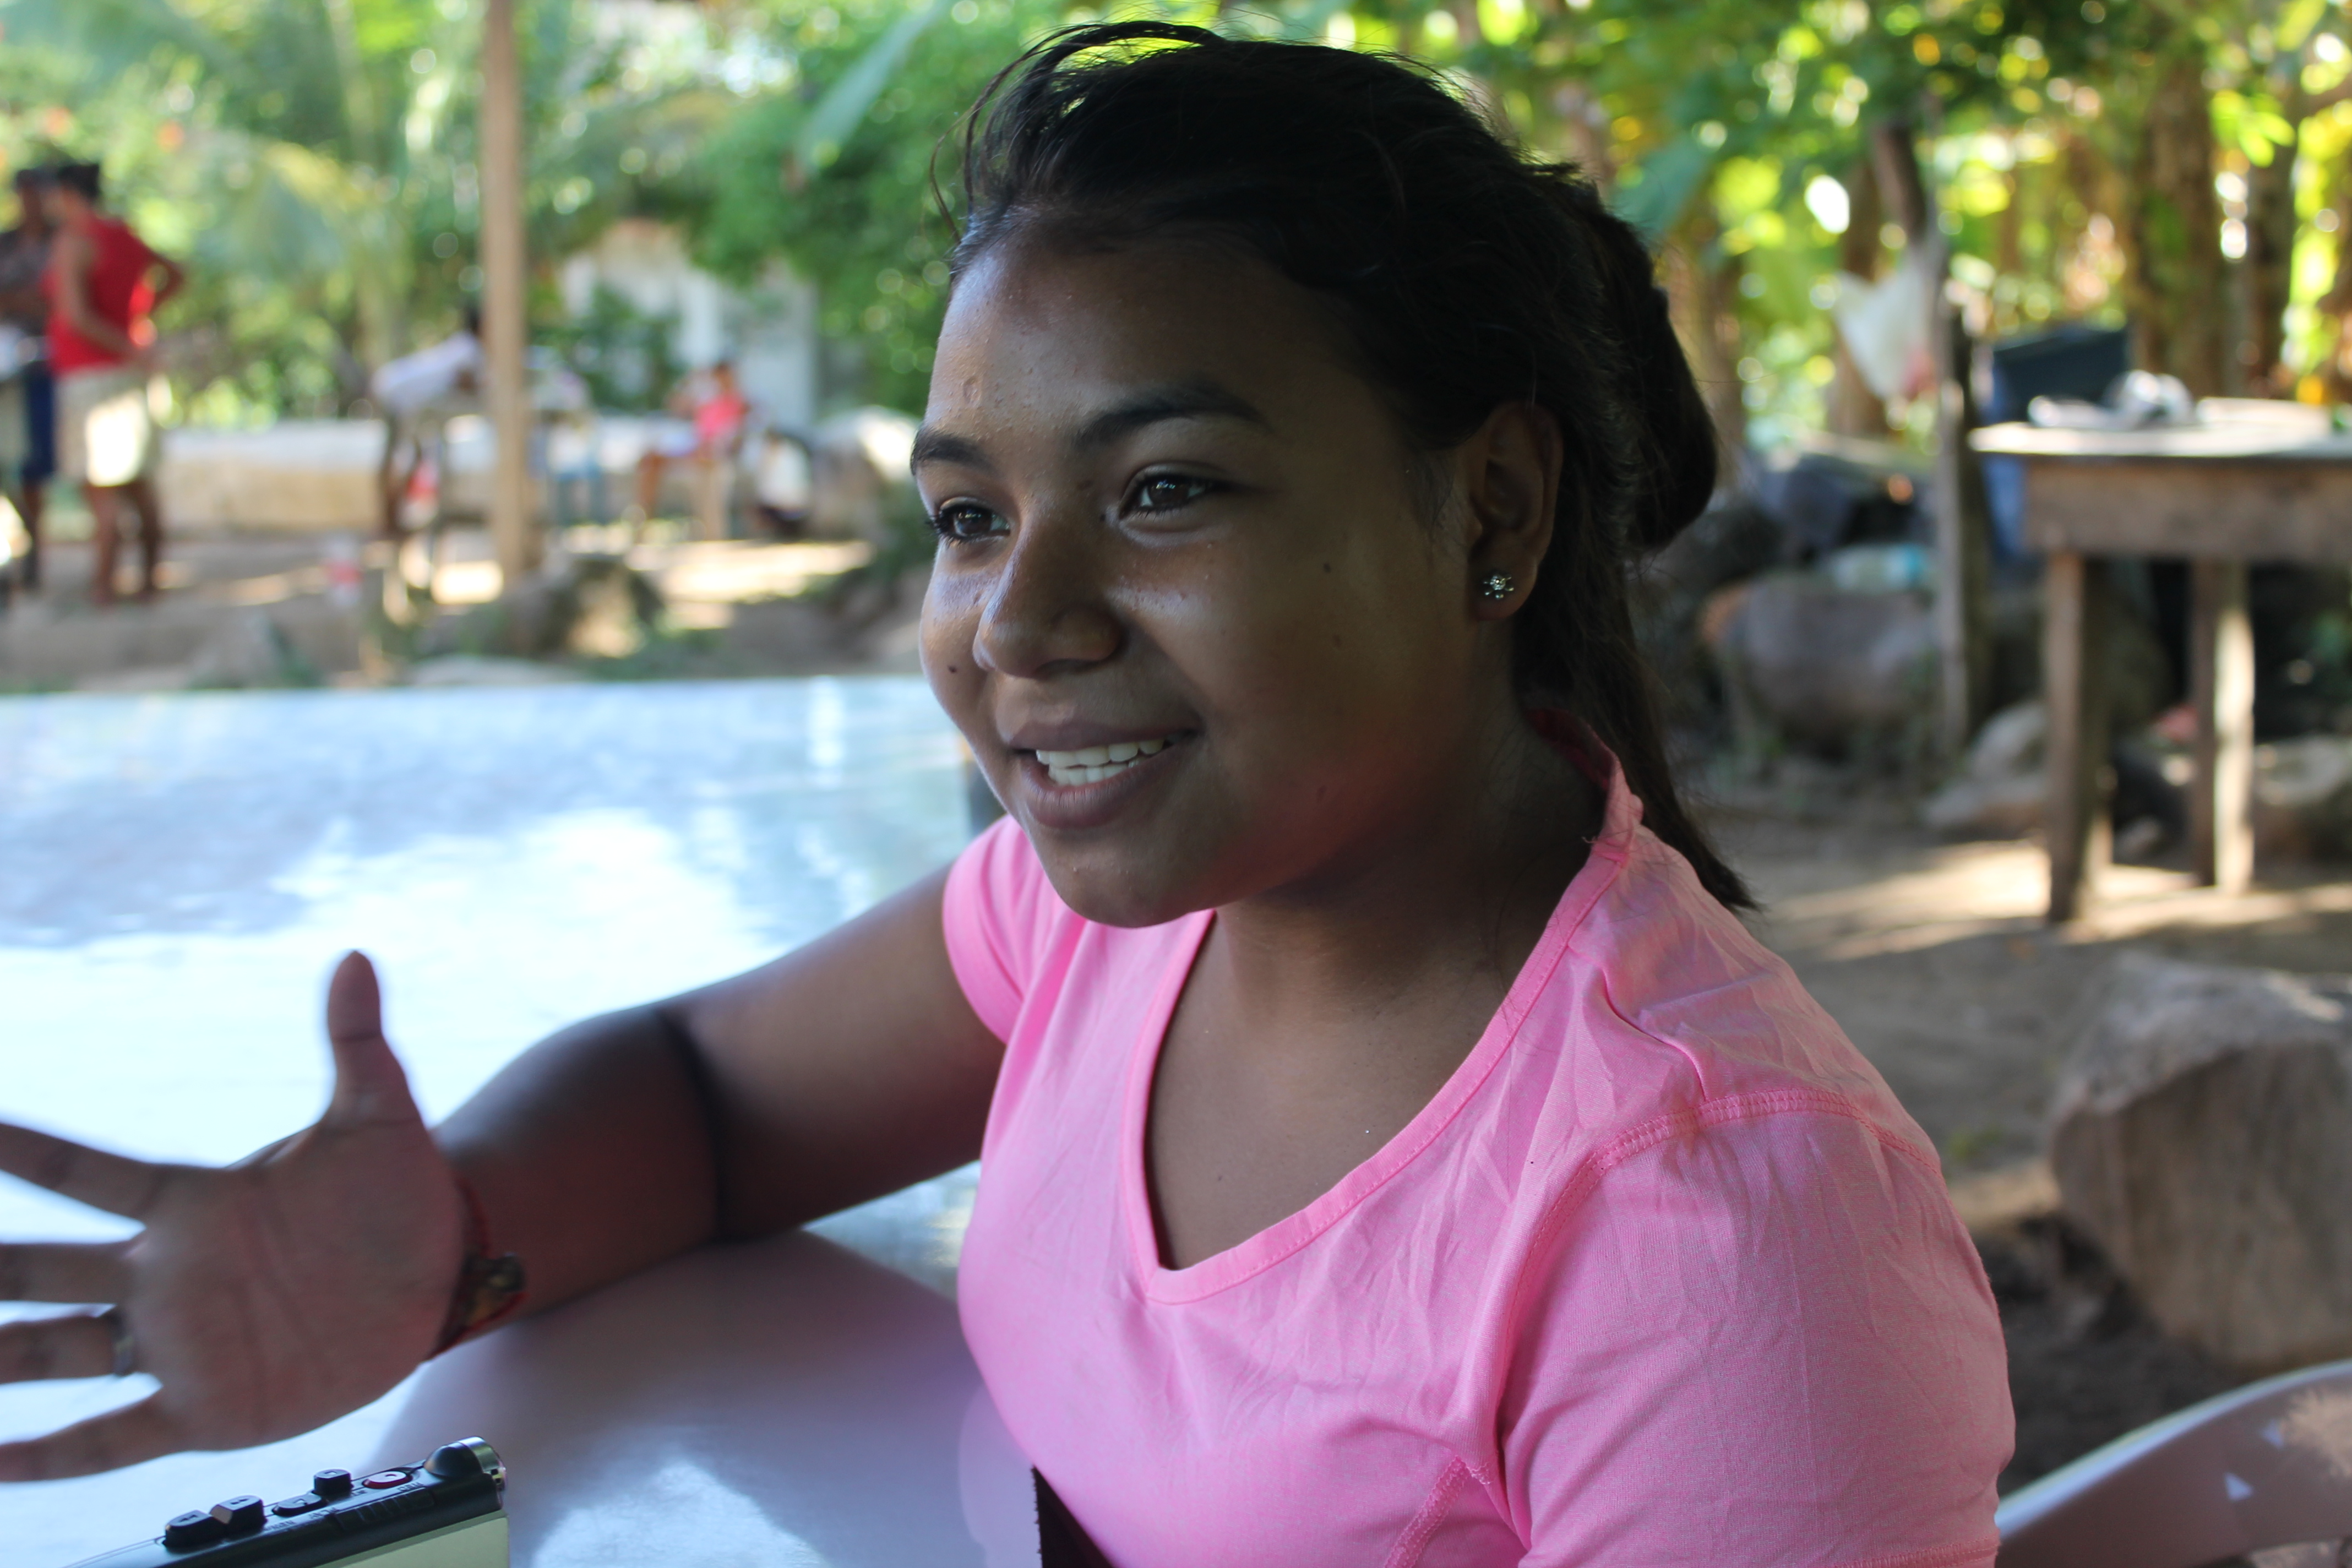 Black caribbean teens